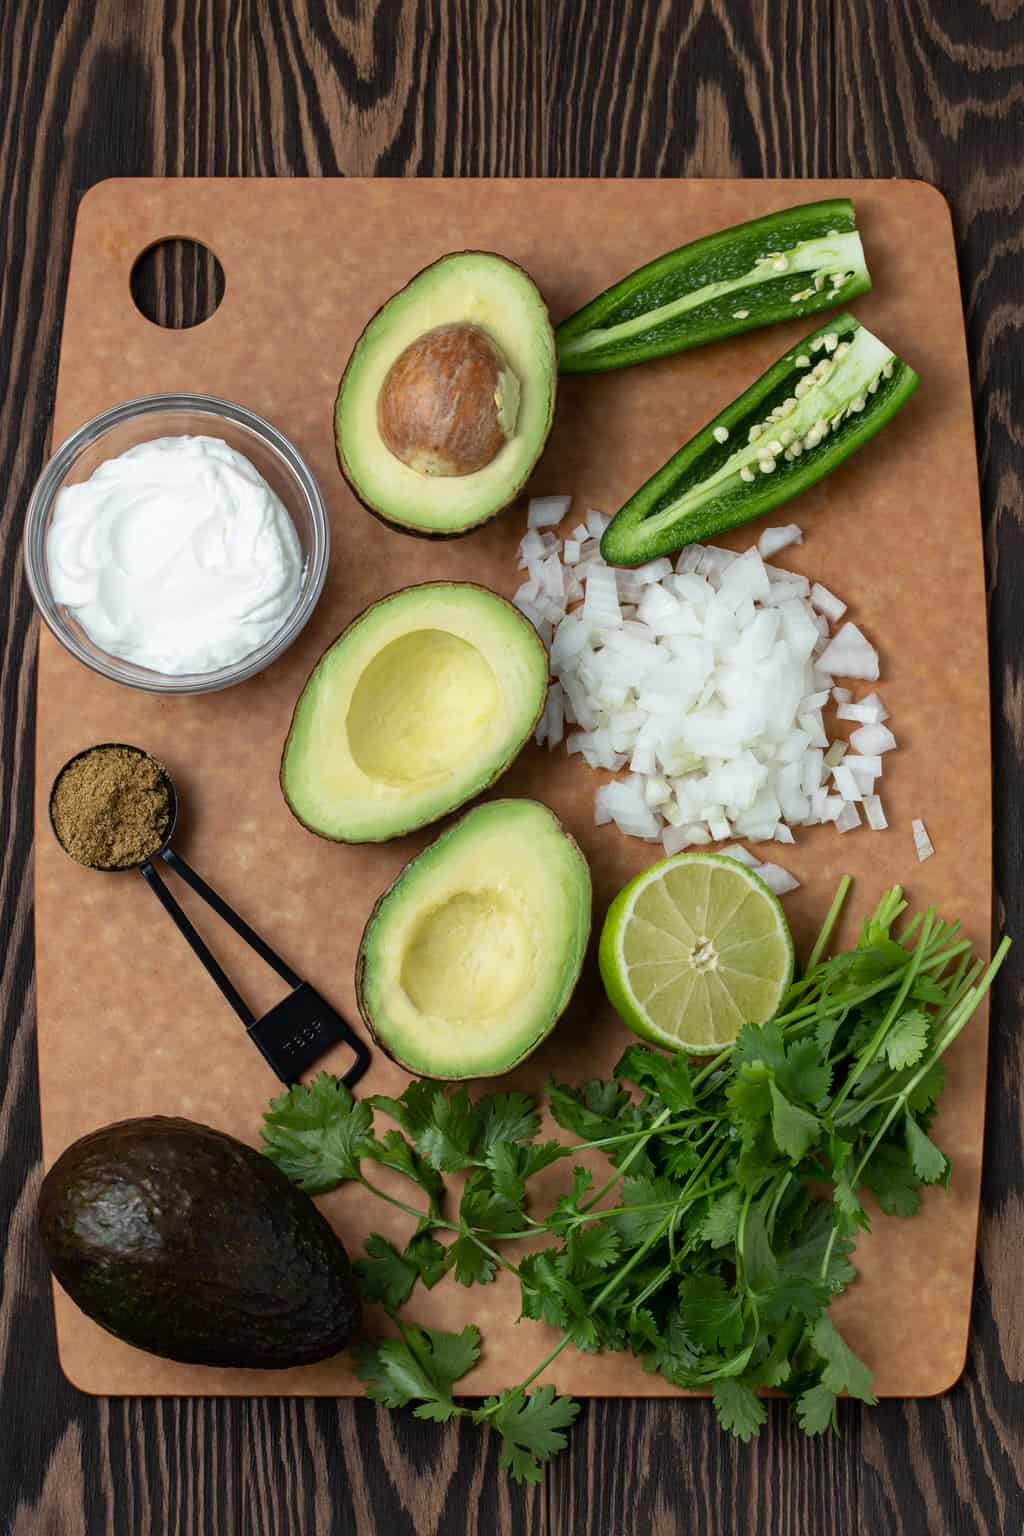 avocado, onion, jalapeno, cumin and yogurt on a tray.